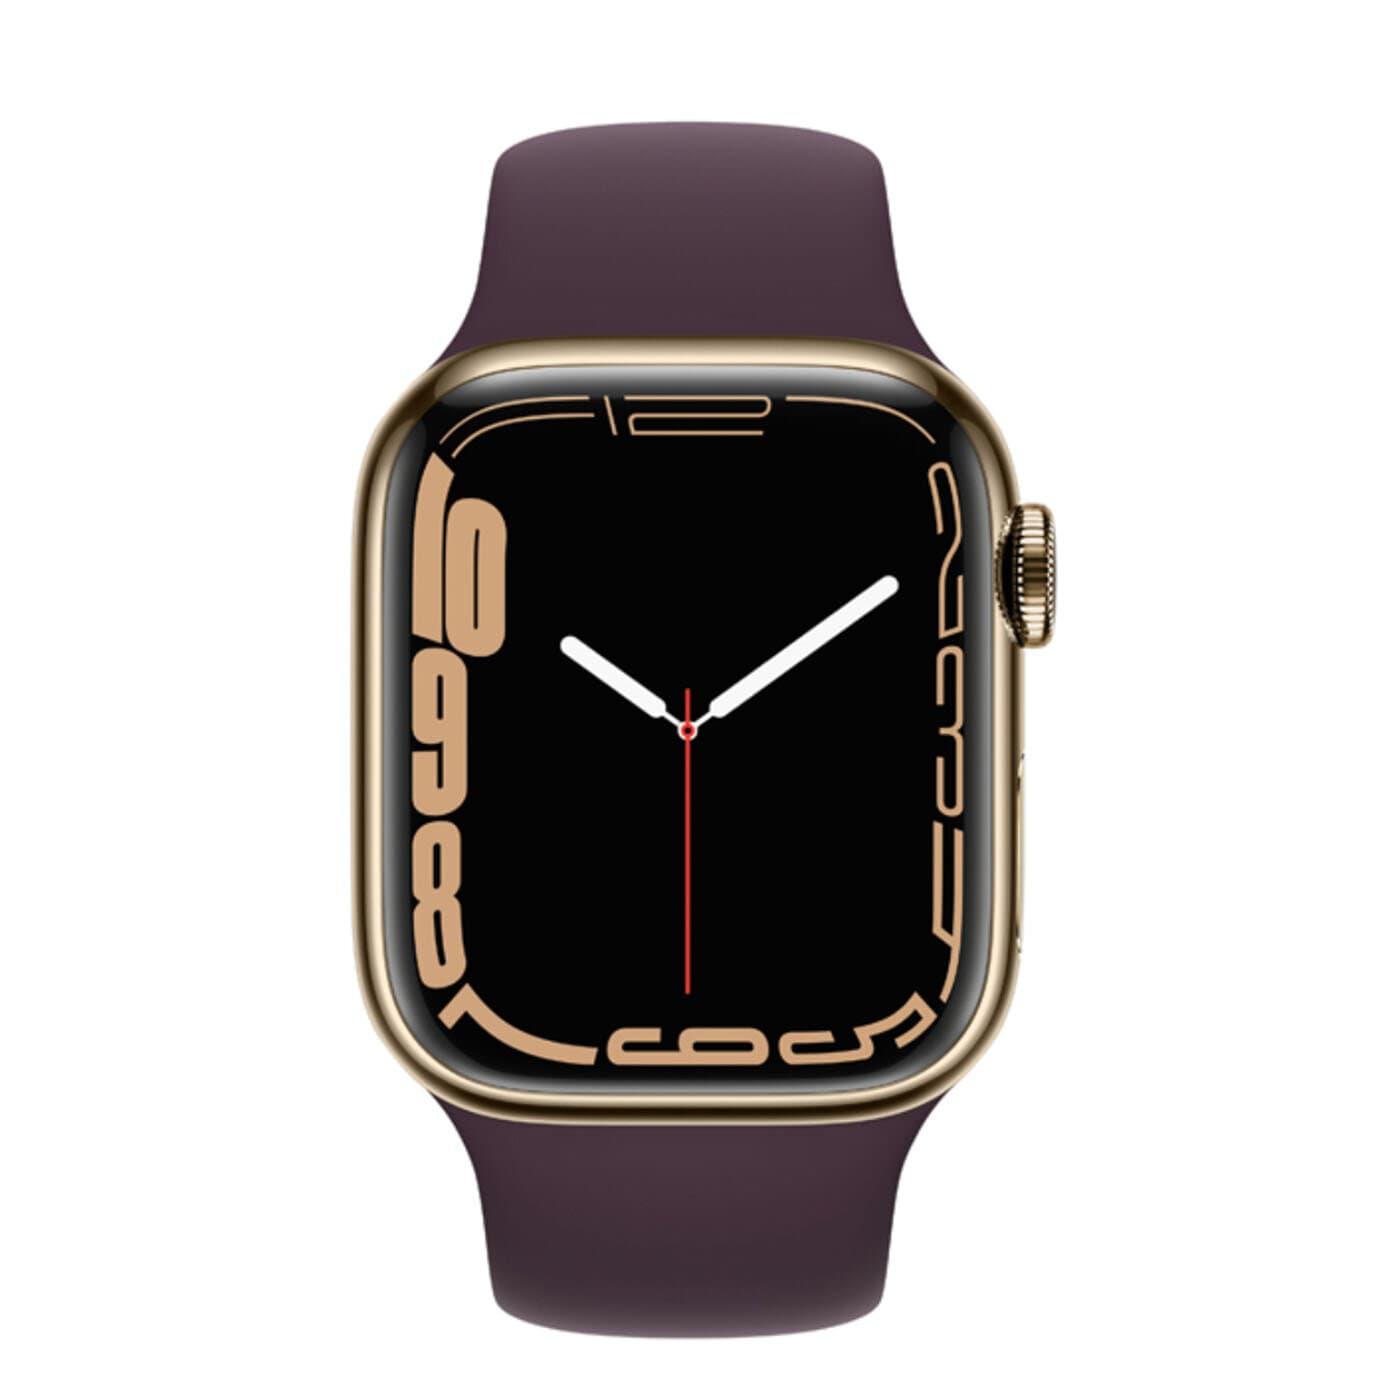 Apple Watch Series 7 Rostfri stålboett med Sportband - Guld